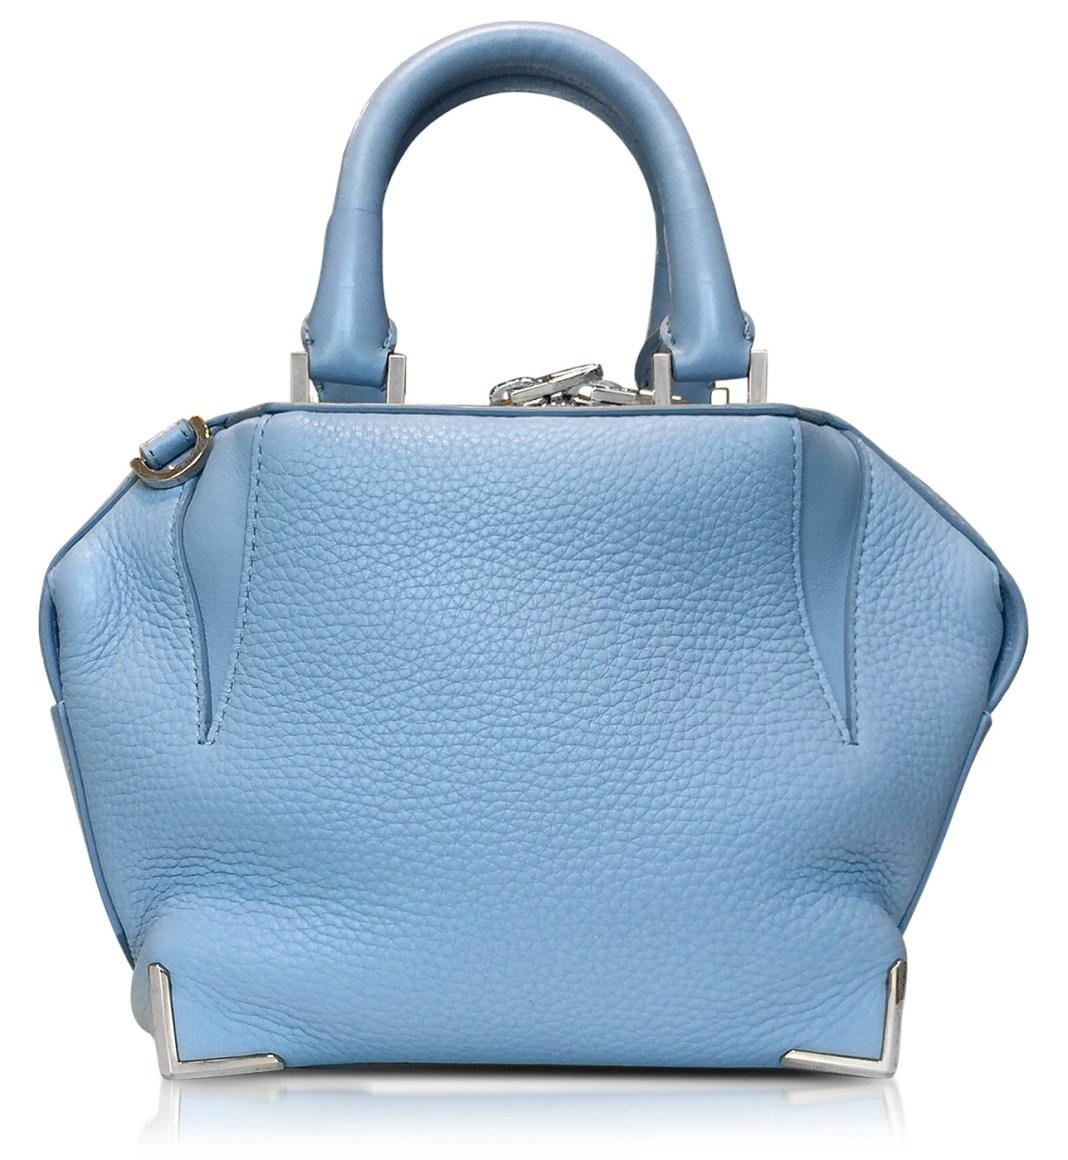 Designer handbags - Alexander Wang Light Blue Mini Emilie Atlas Soft Pebbled Leather Tote